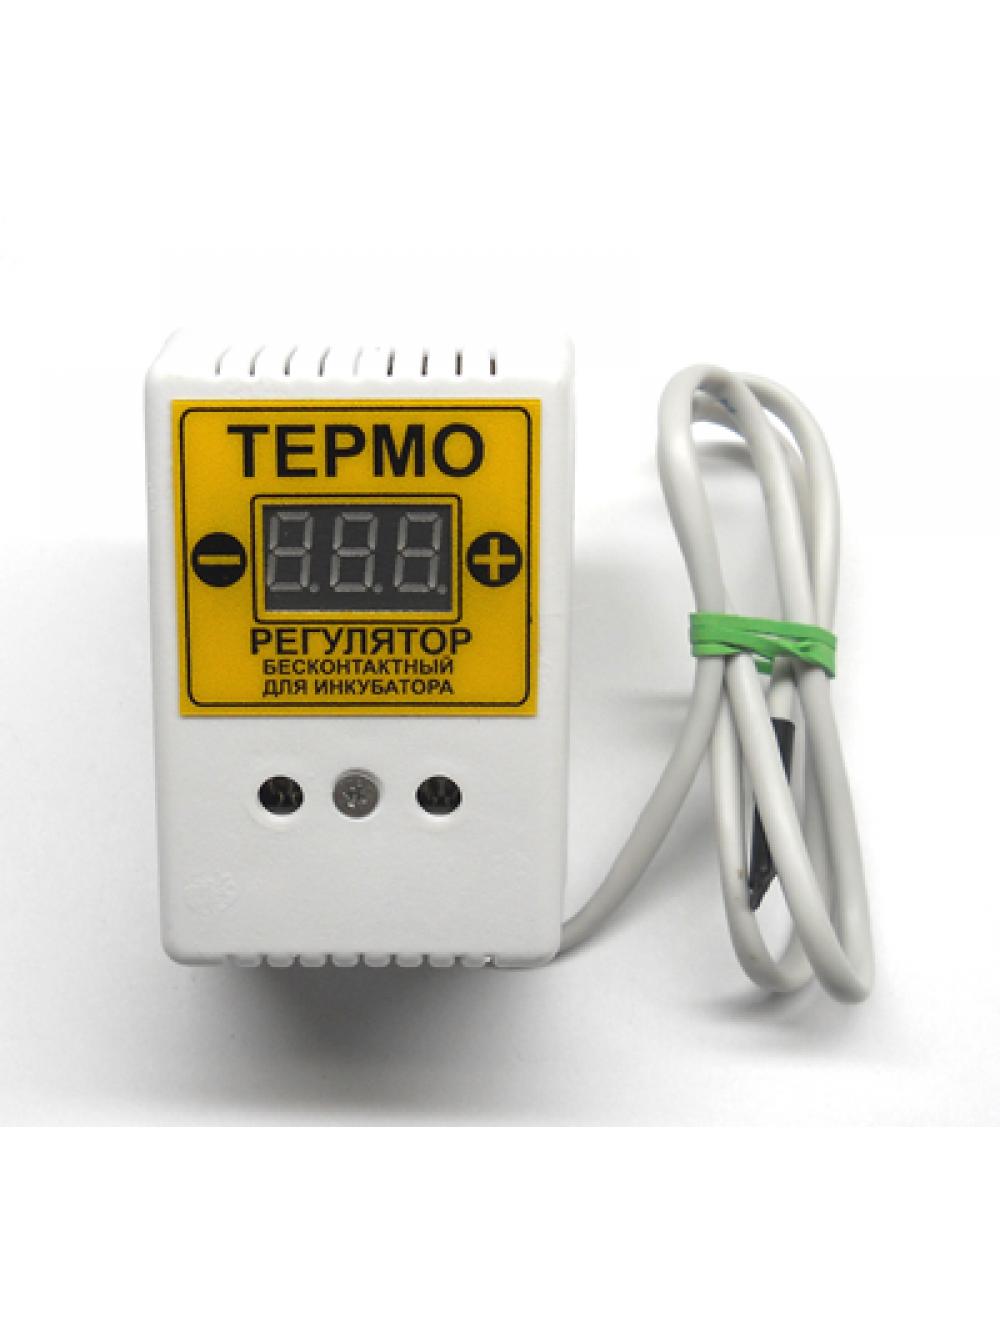 Терморегулятор цифровой для инкубатора